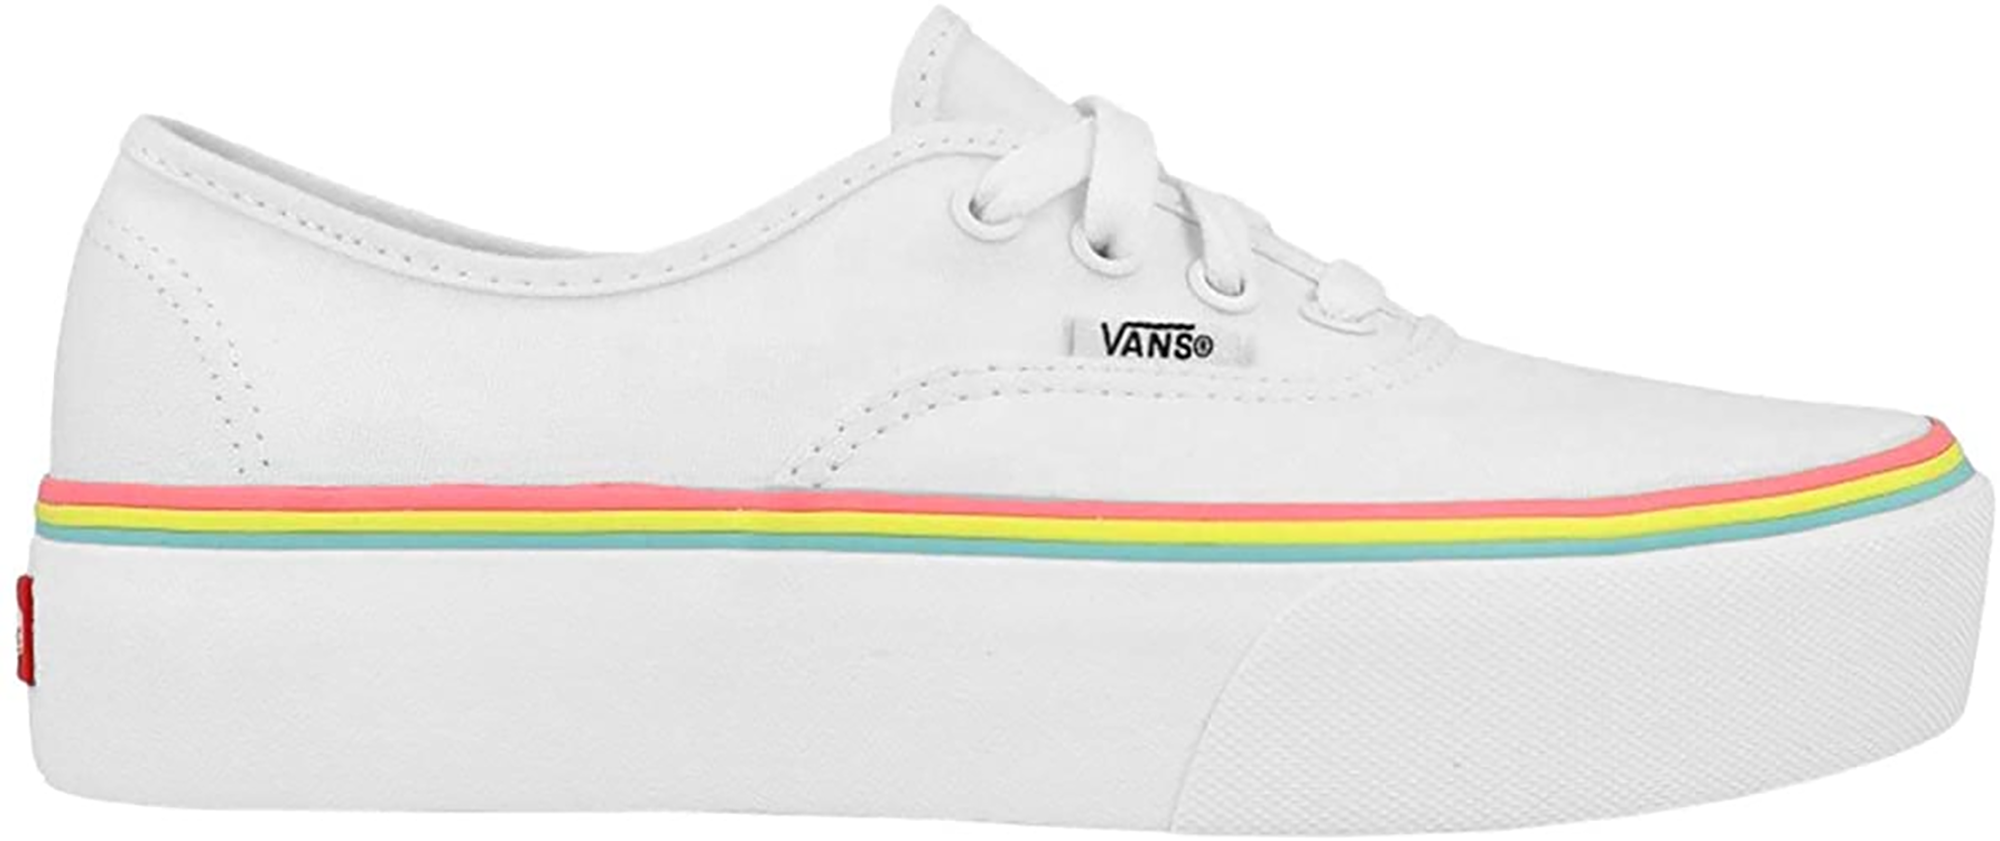 Vans Authentic Platform 2.0 Rainbow